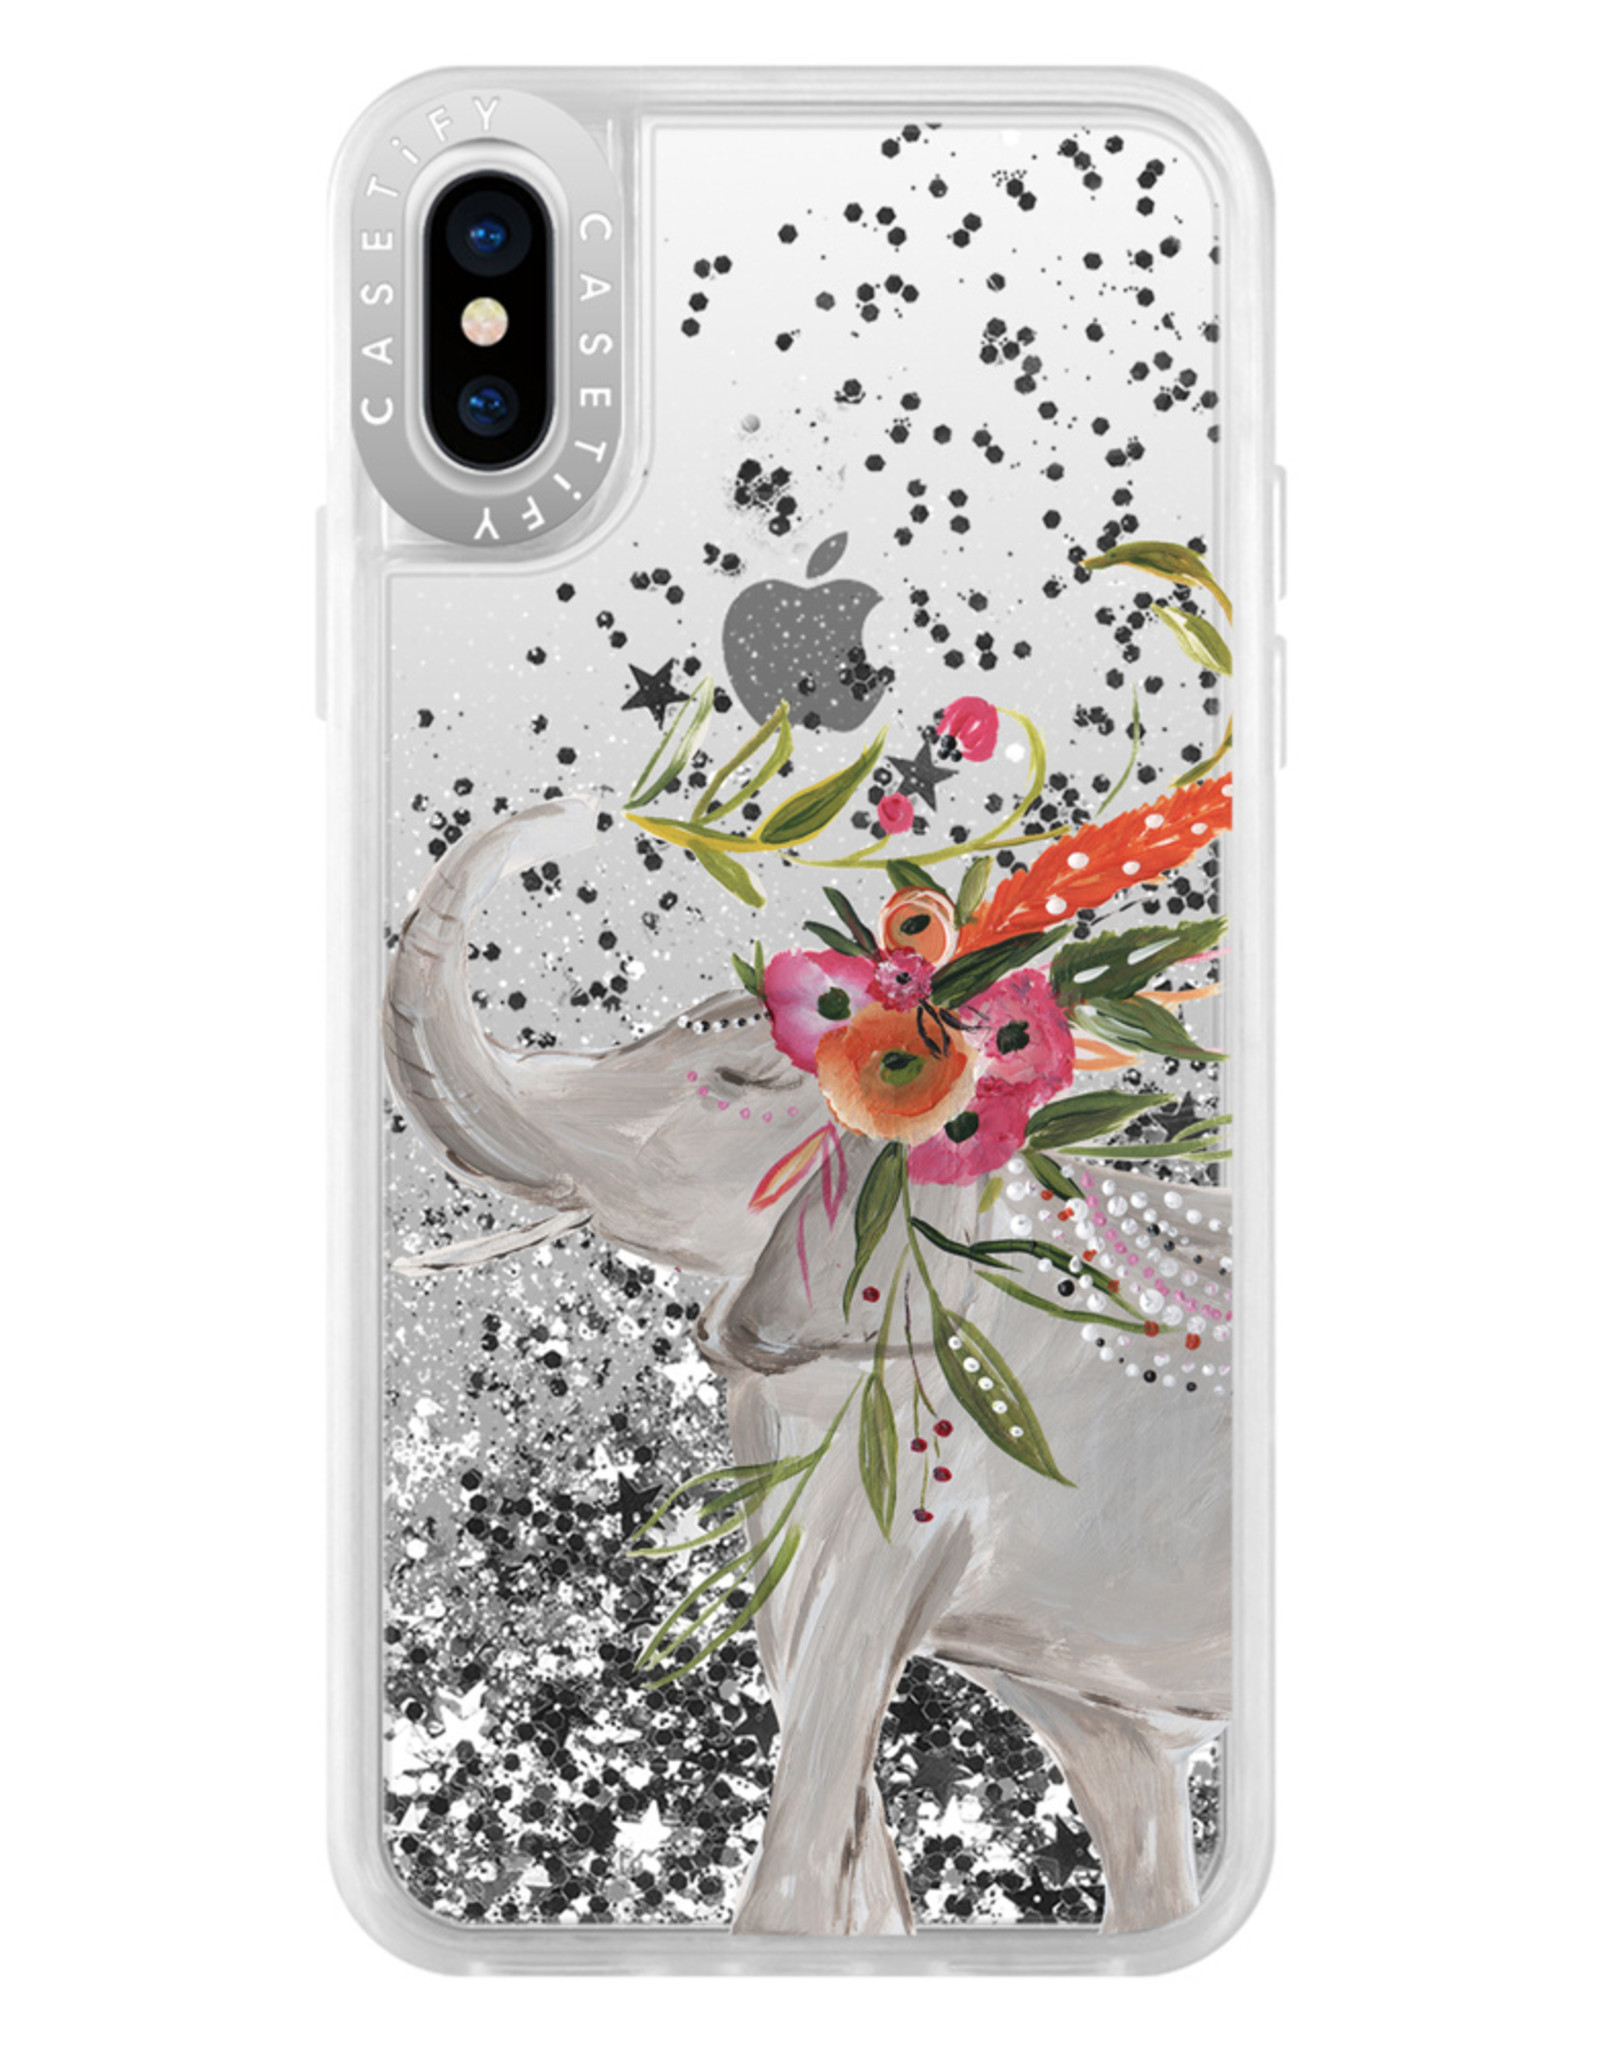 Casetify /// Casetify - Gliter Case Boho Elephant for iPhone XS/X 120-1196